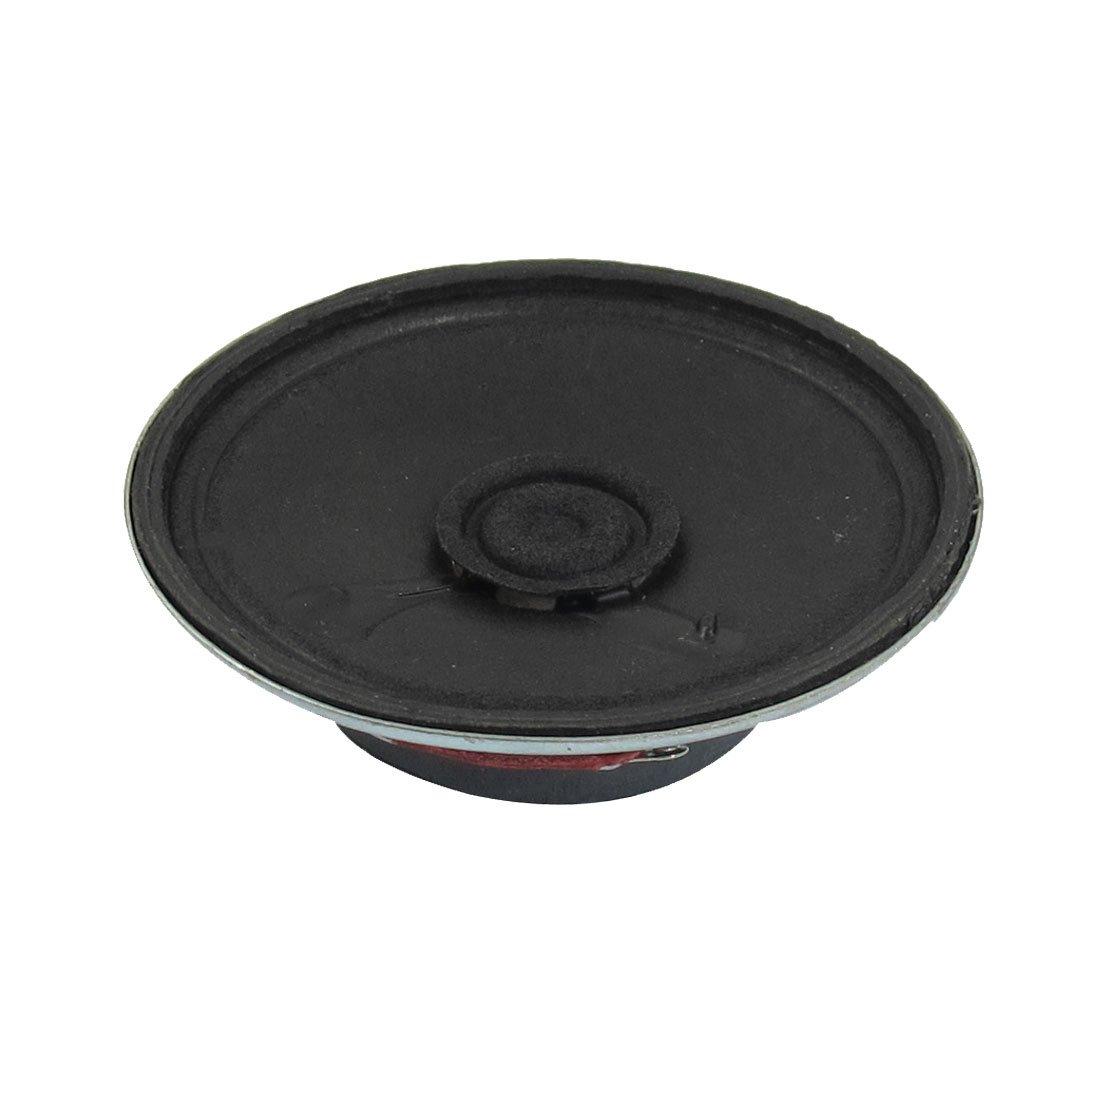 uxcell 57mm Dia Silver Tone Round External Magnet Speaker Loudspeaker 8 Ohm 0.5W